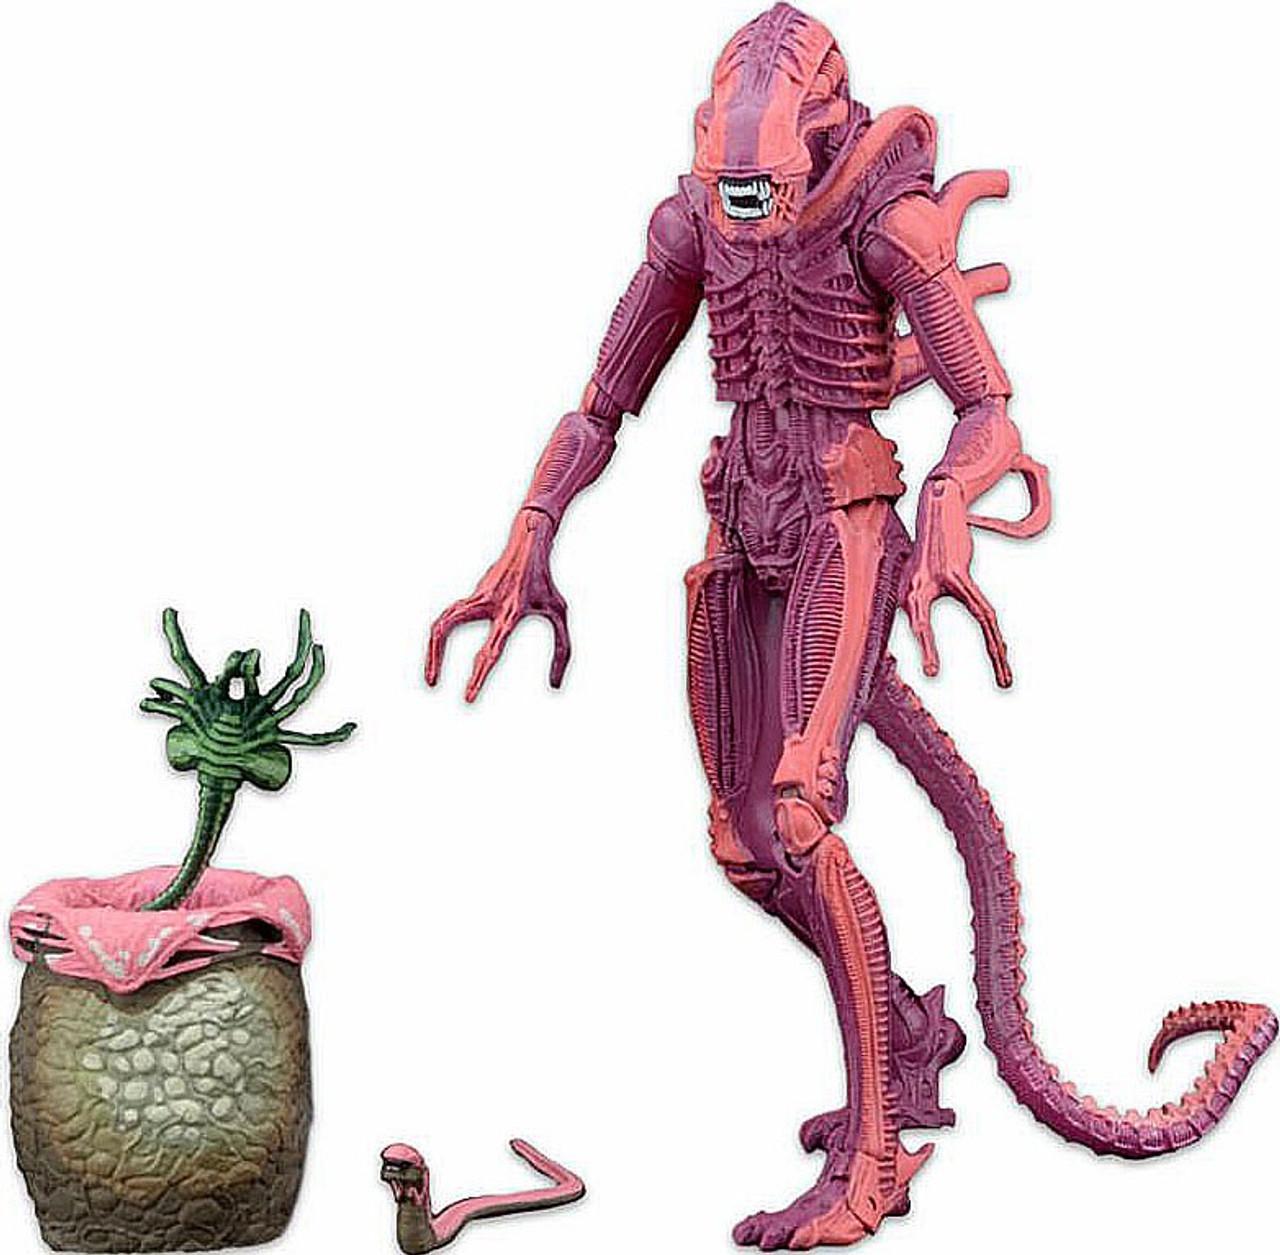 NECA Aliens Xenomorph Warrior (Arcade Appearance) Action Figure